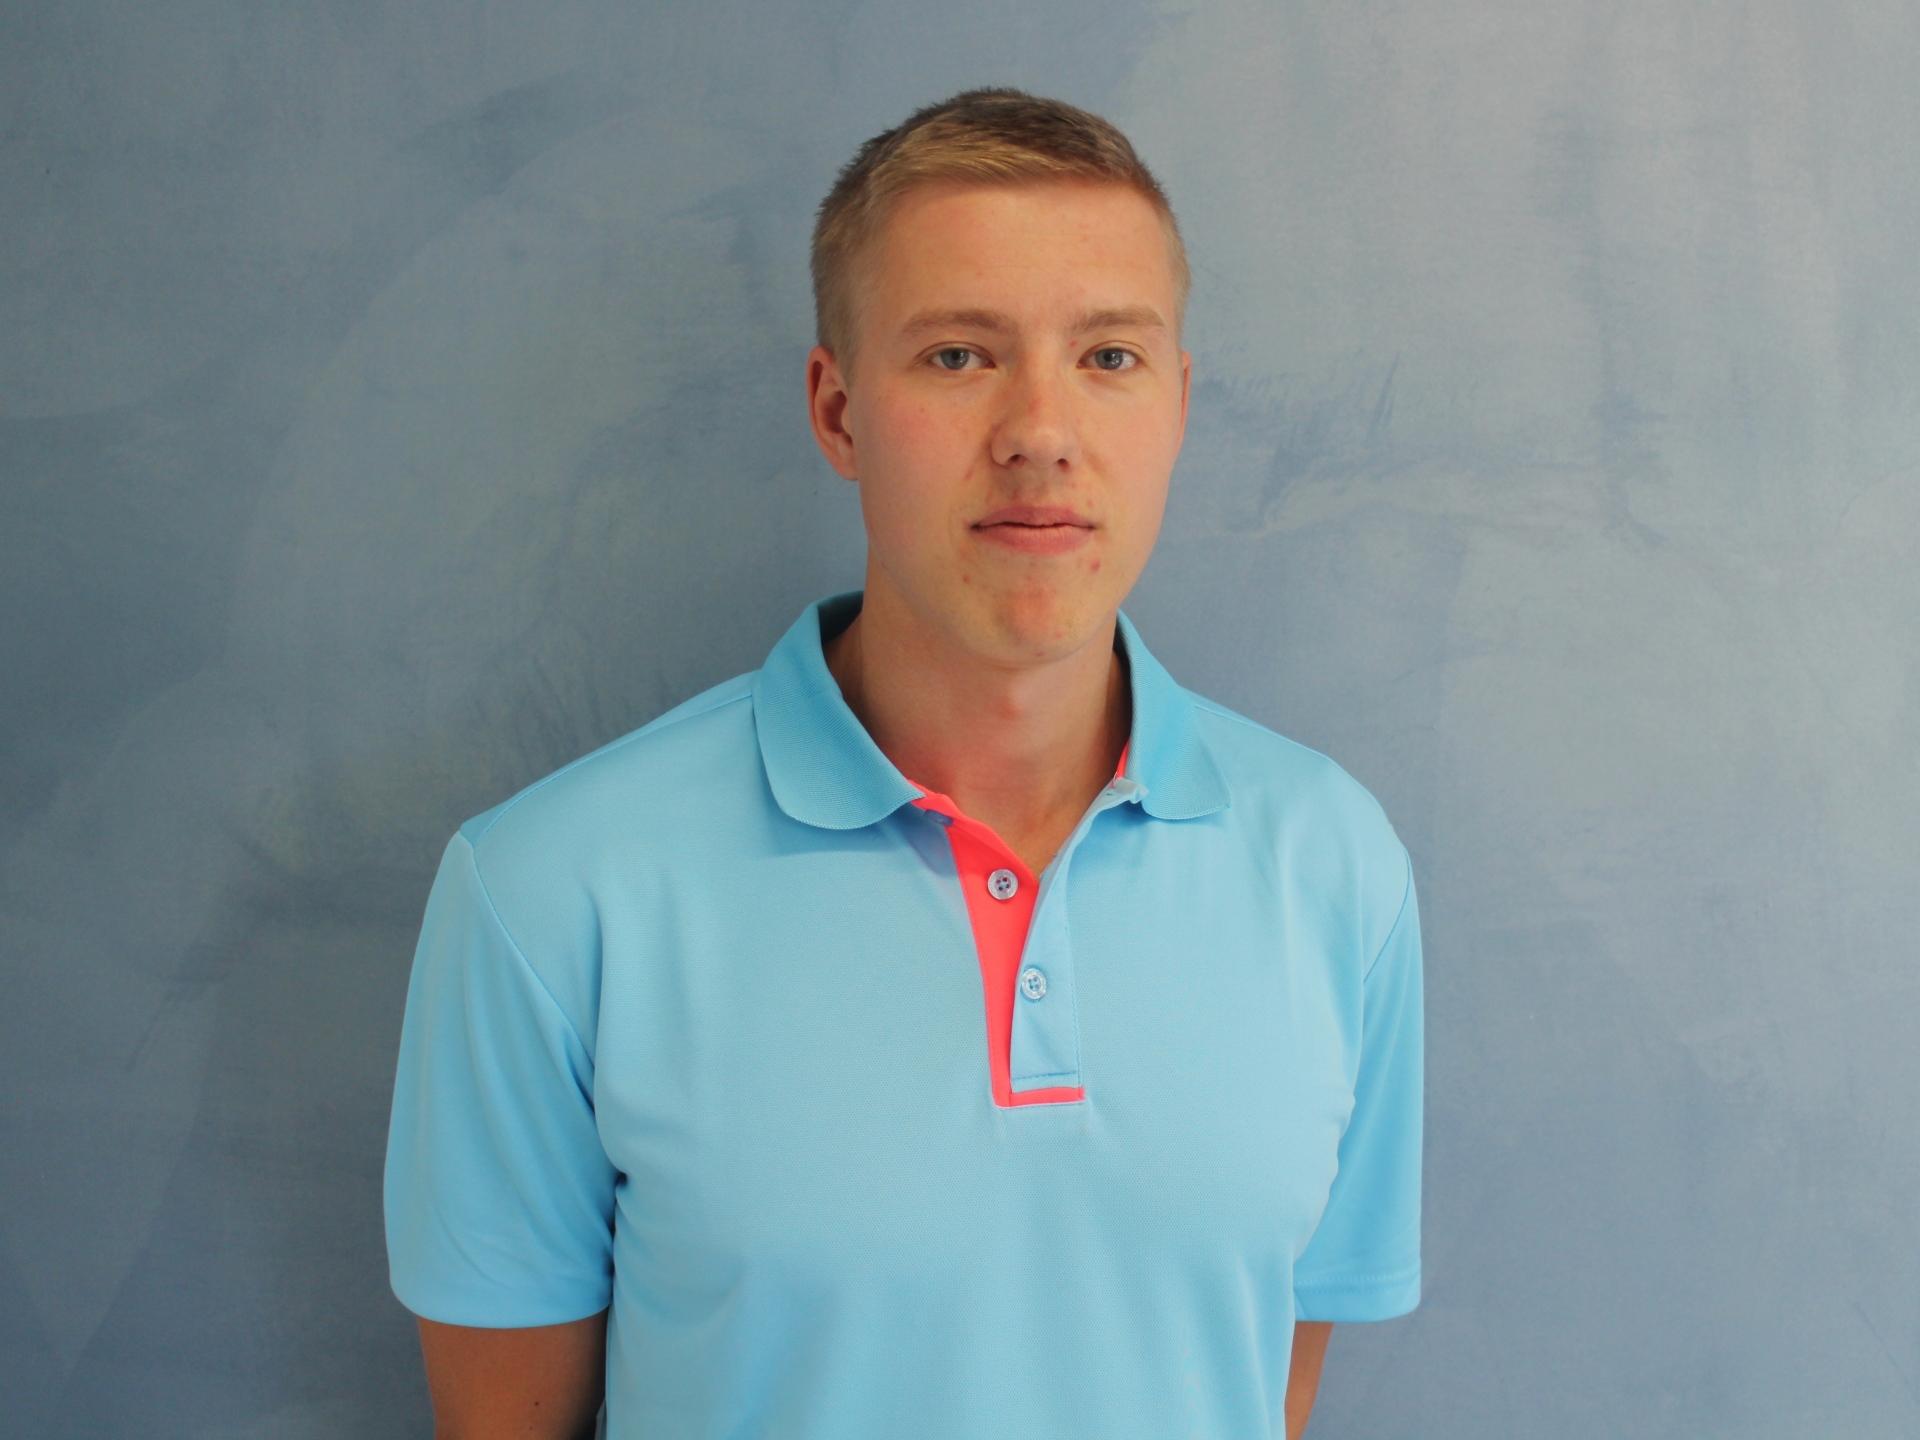 Olli-Pekka Nuuttila